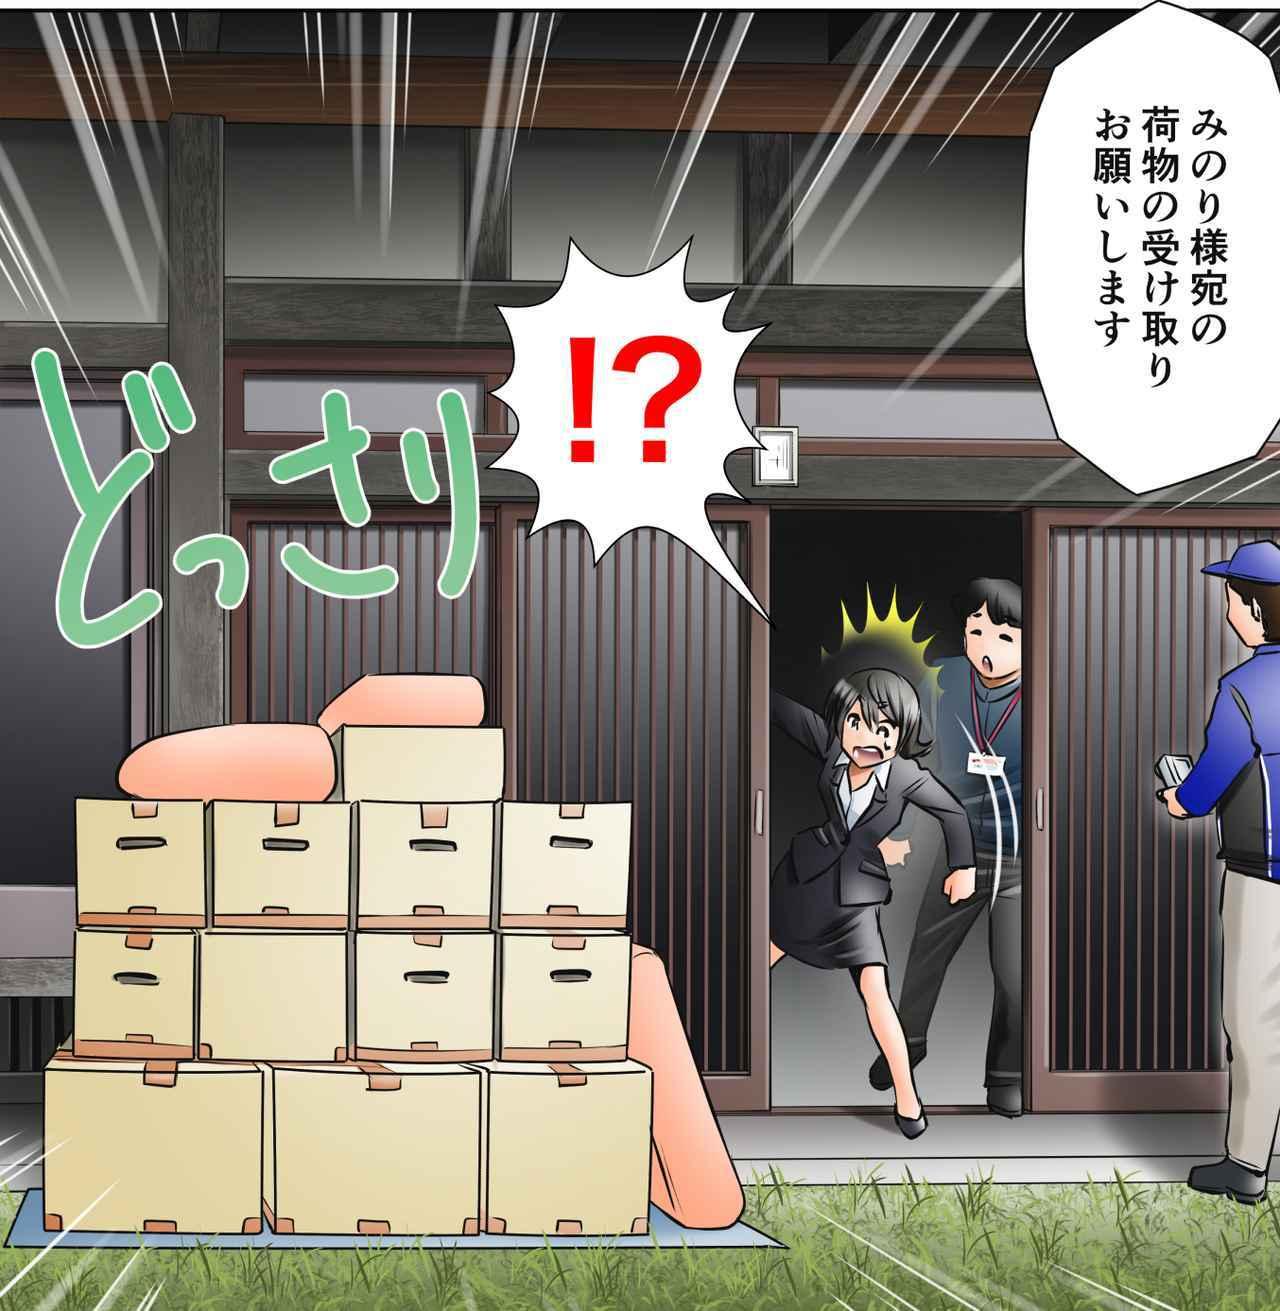 画像4: ja.honda-powerproducts.com